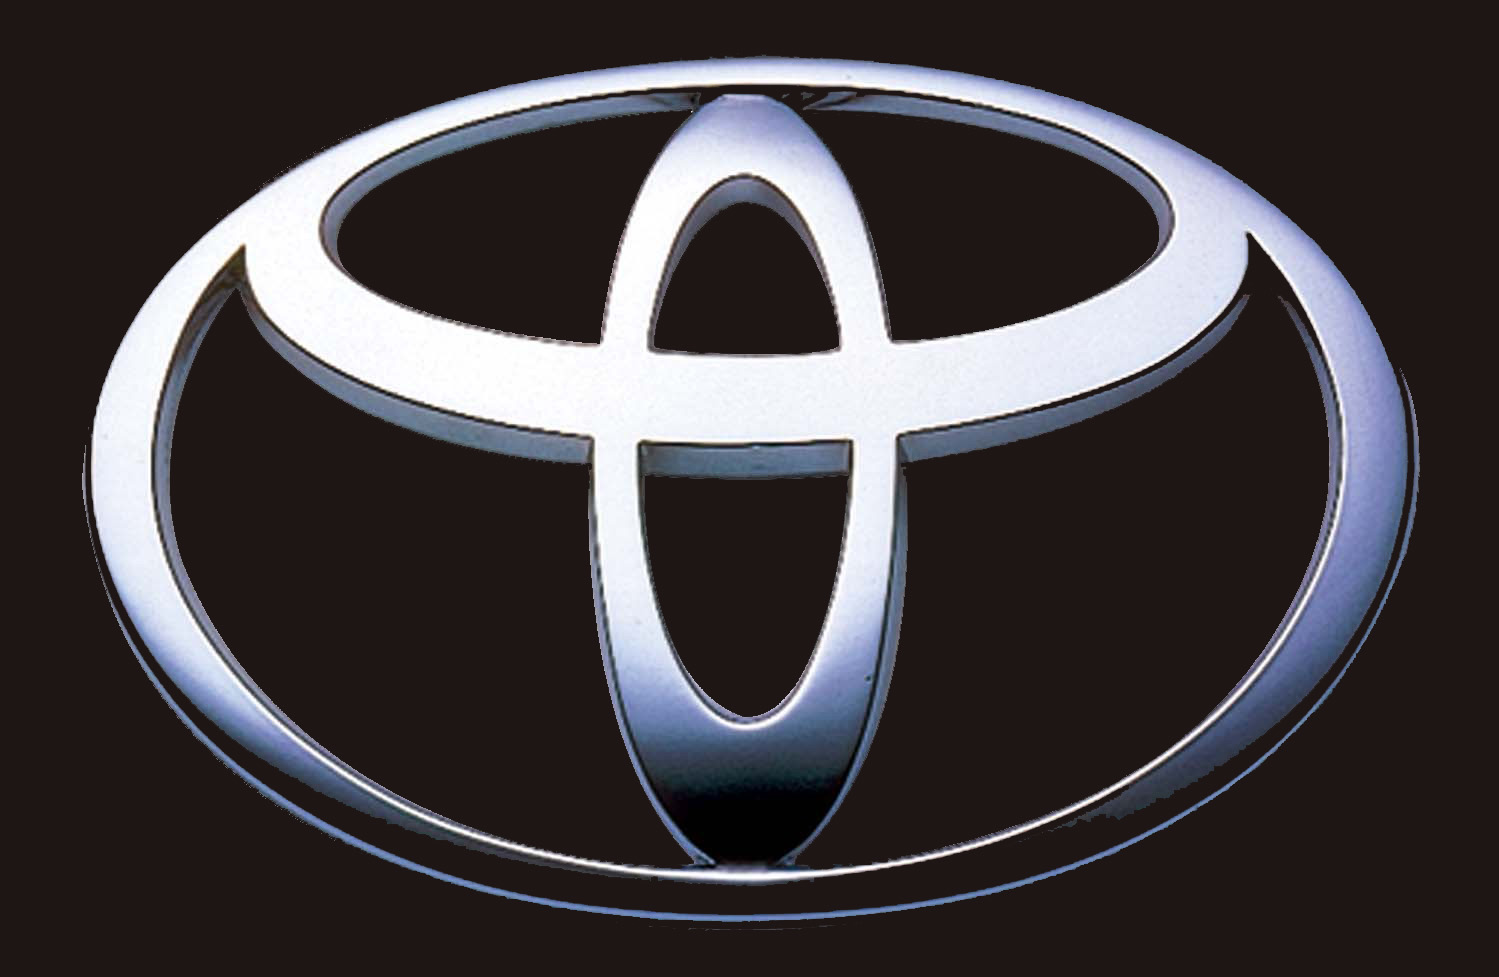 Toyota Logo HD HD Wallpapers Pulse 1499x977